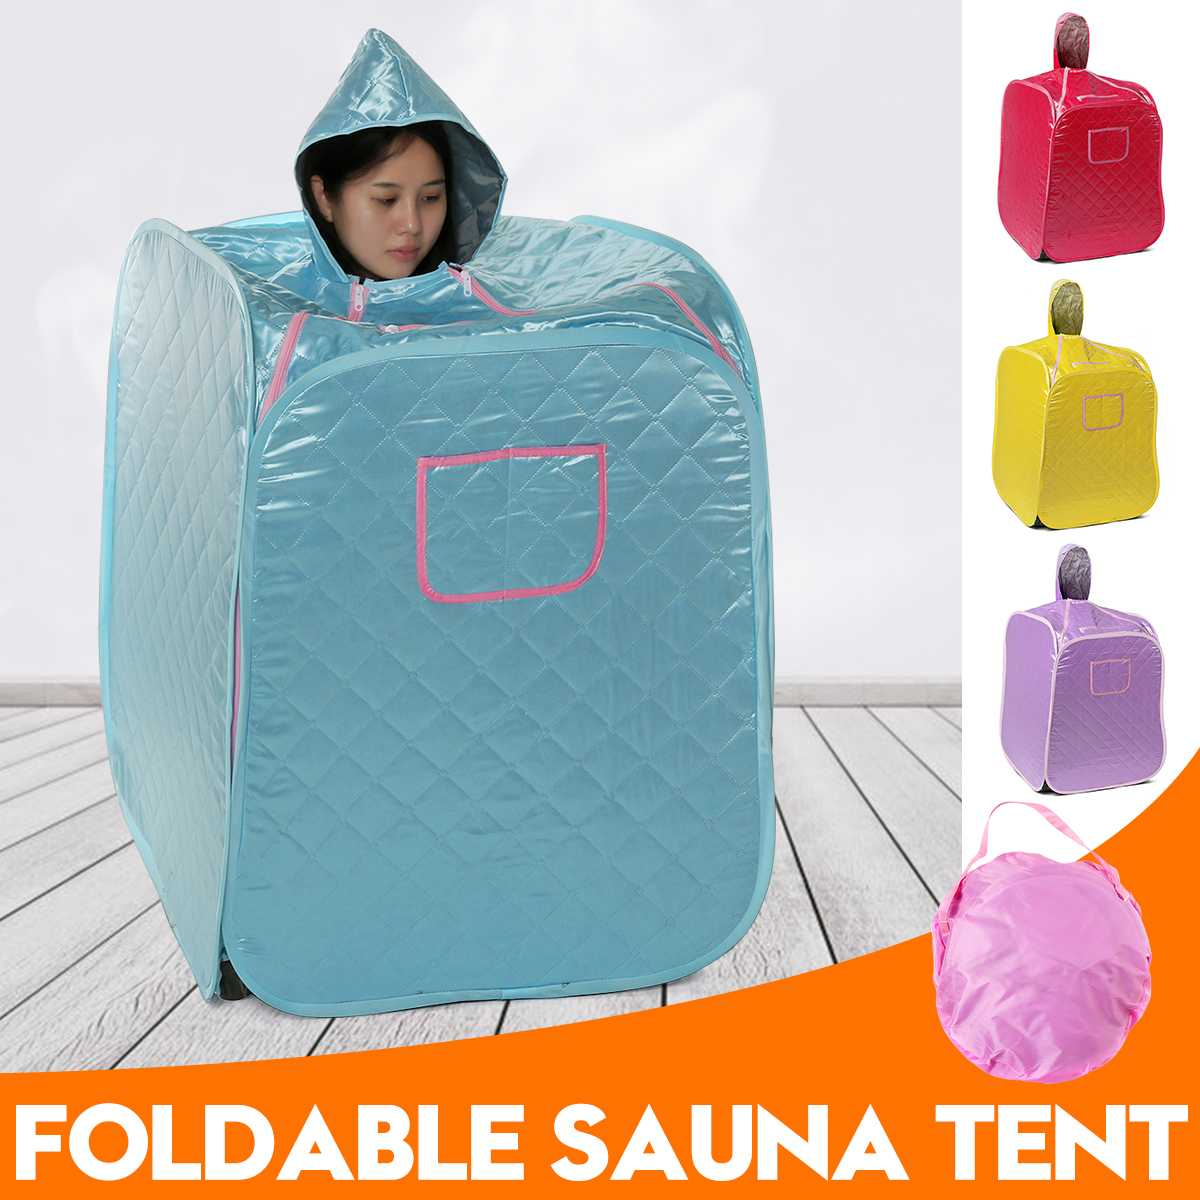 Steam Sauna Tent Portable Spa Room Home Beneficial Full Body Slimming Folding Detox Therapy Steam Fold Sauna Cabin Sauna Room